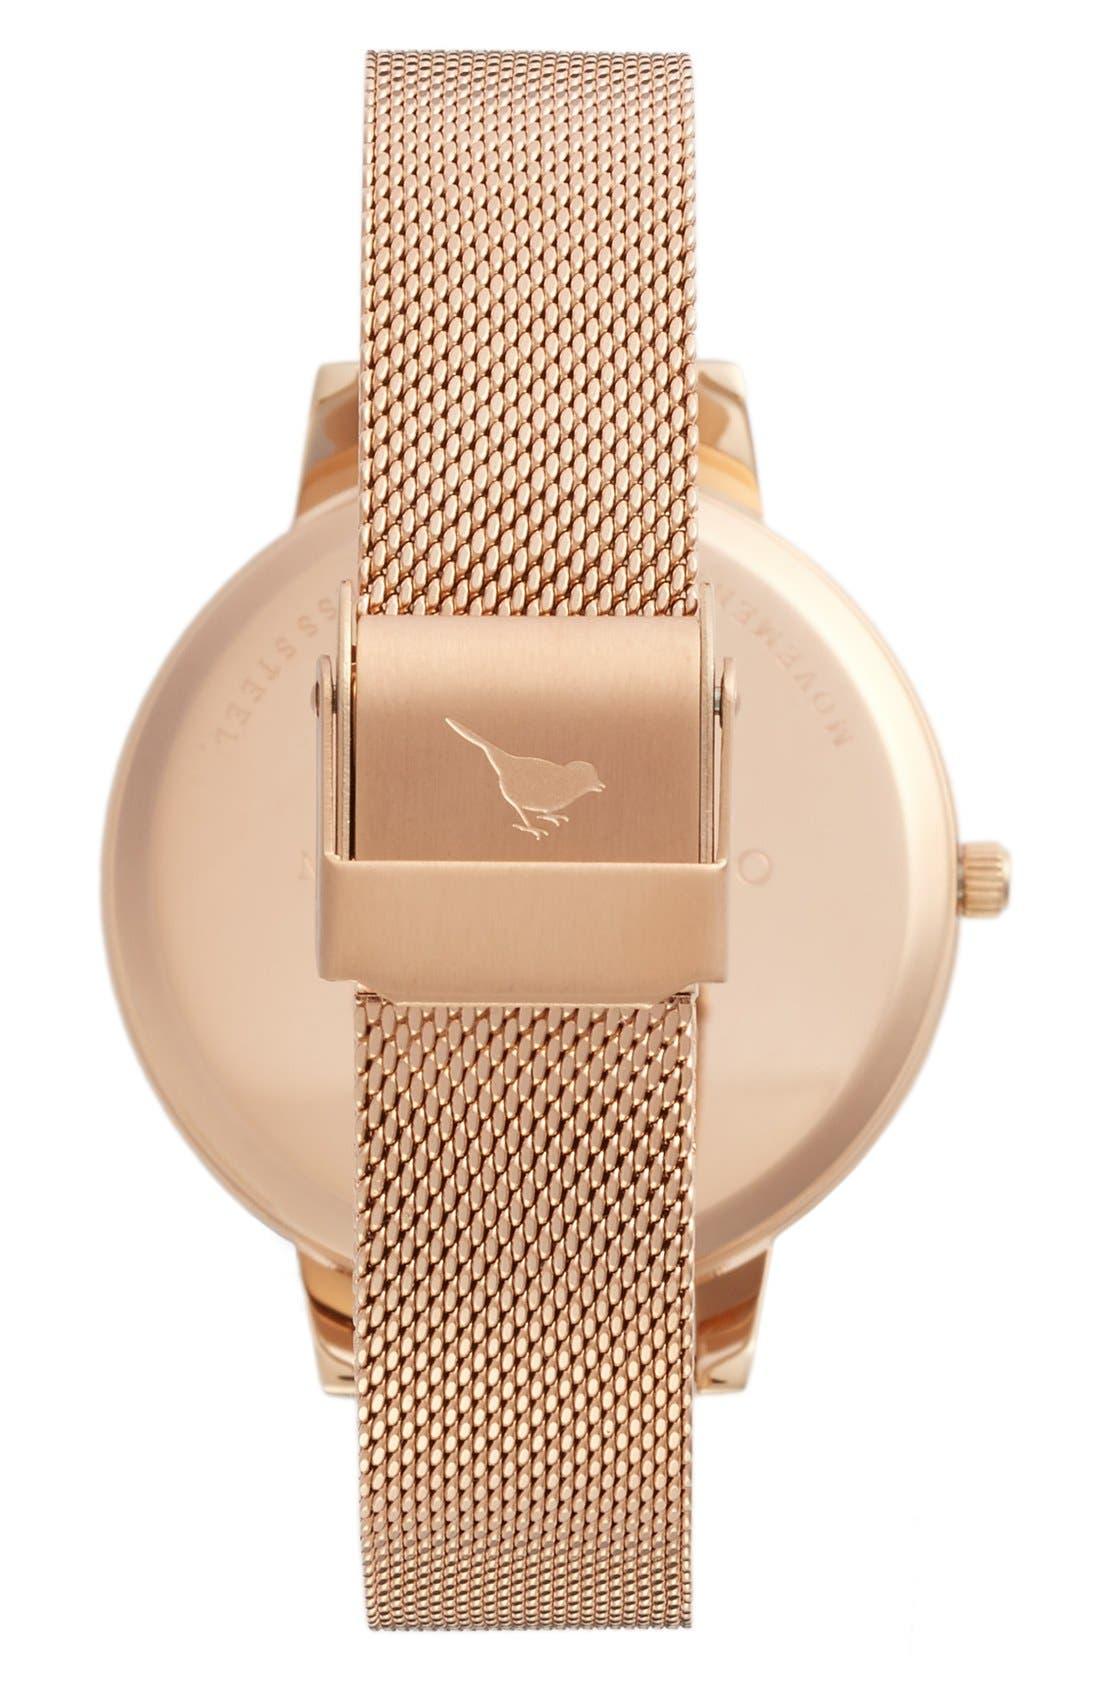 OLIVIA BURTON, Signature Florals Mesh Bracelet Watch, 38mm, Alternate thumbnail 7, color, ROSE GOLD/ ROSE GOLD/ WHITE